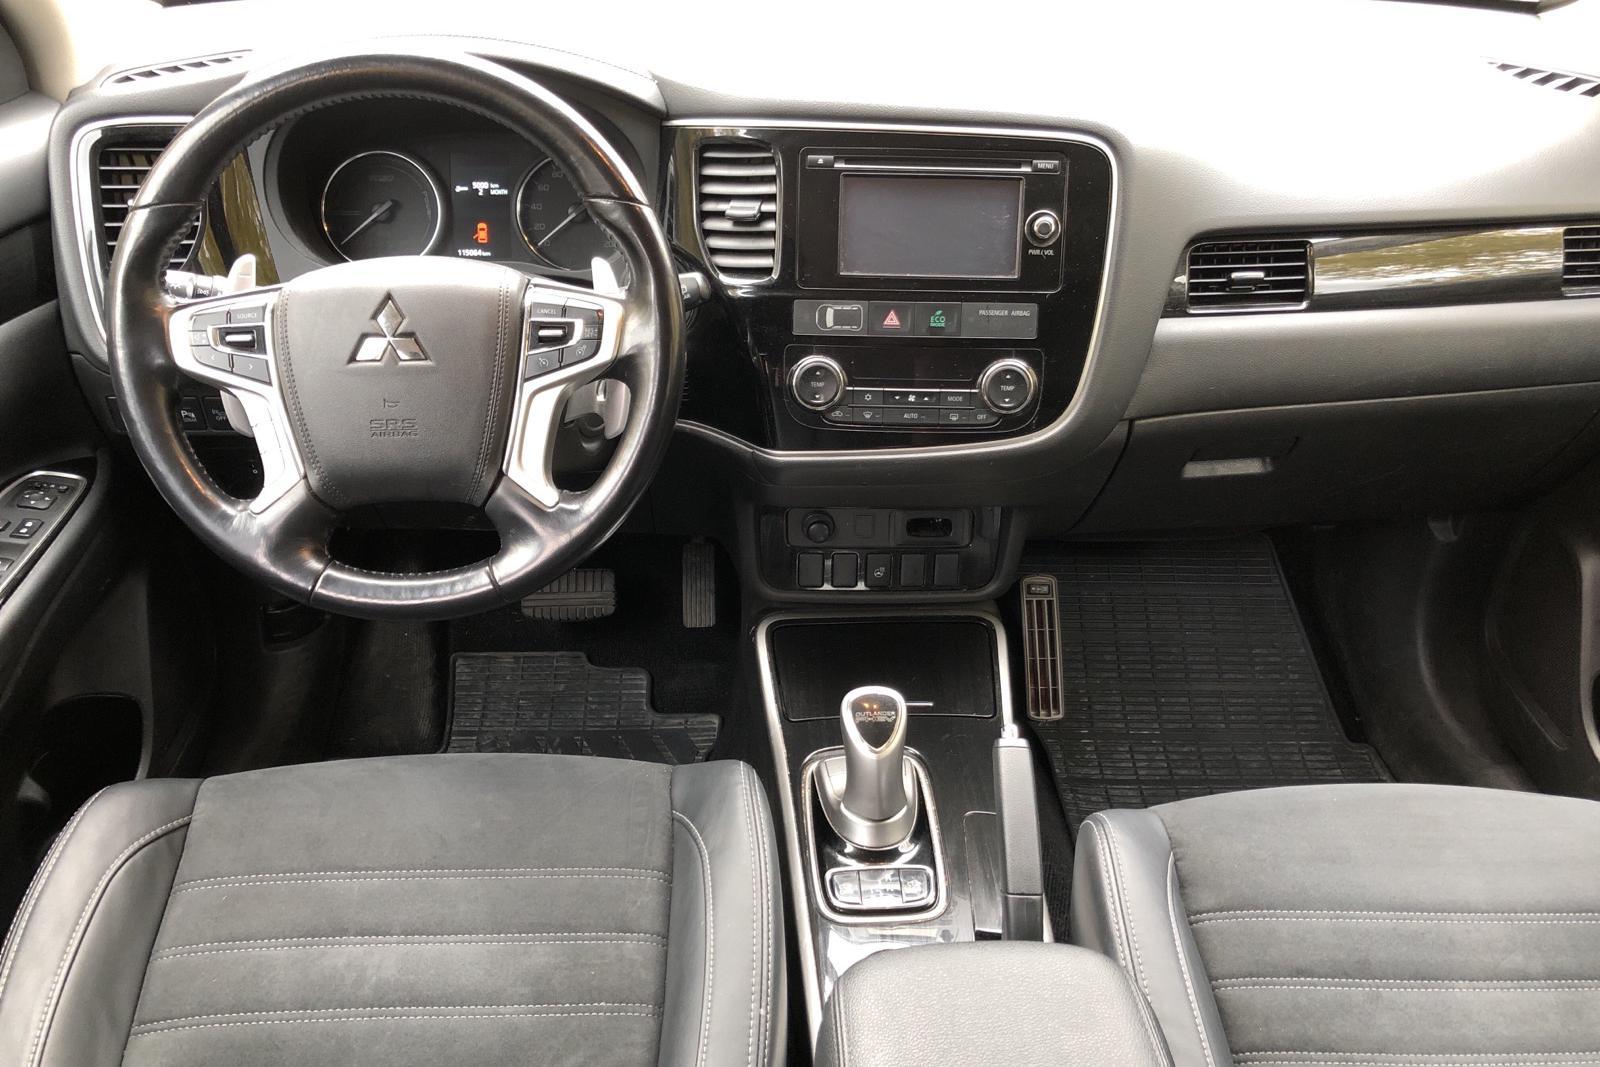 Mitsubishi Outlander 2.0 Plug-in Hybrid 4WD (121hk) - 80 299 km - Automatic - white - 2016